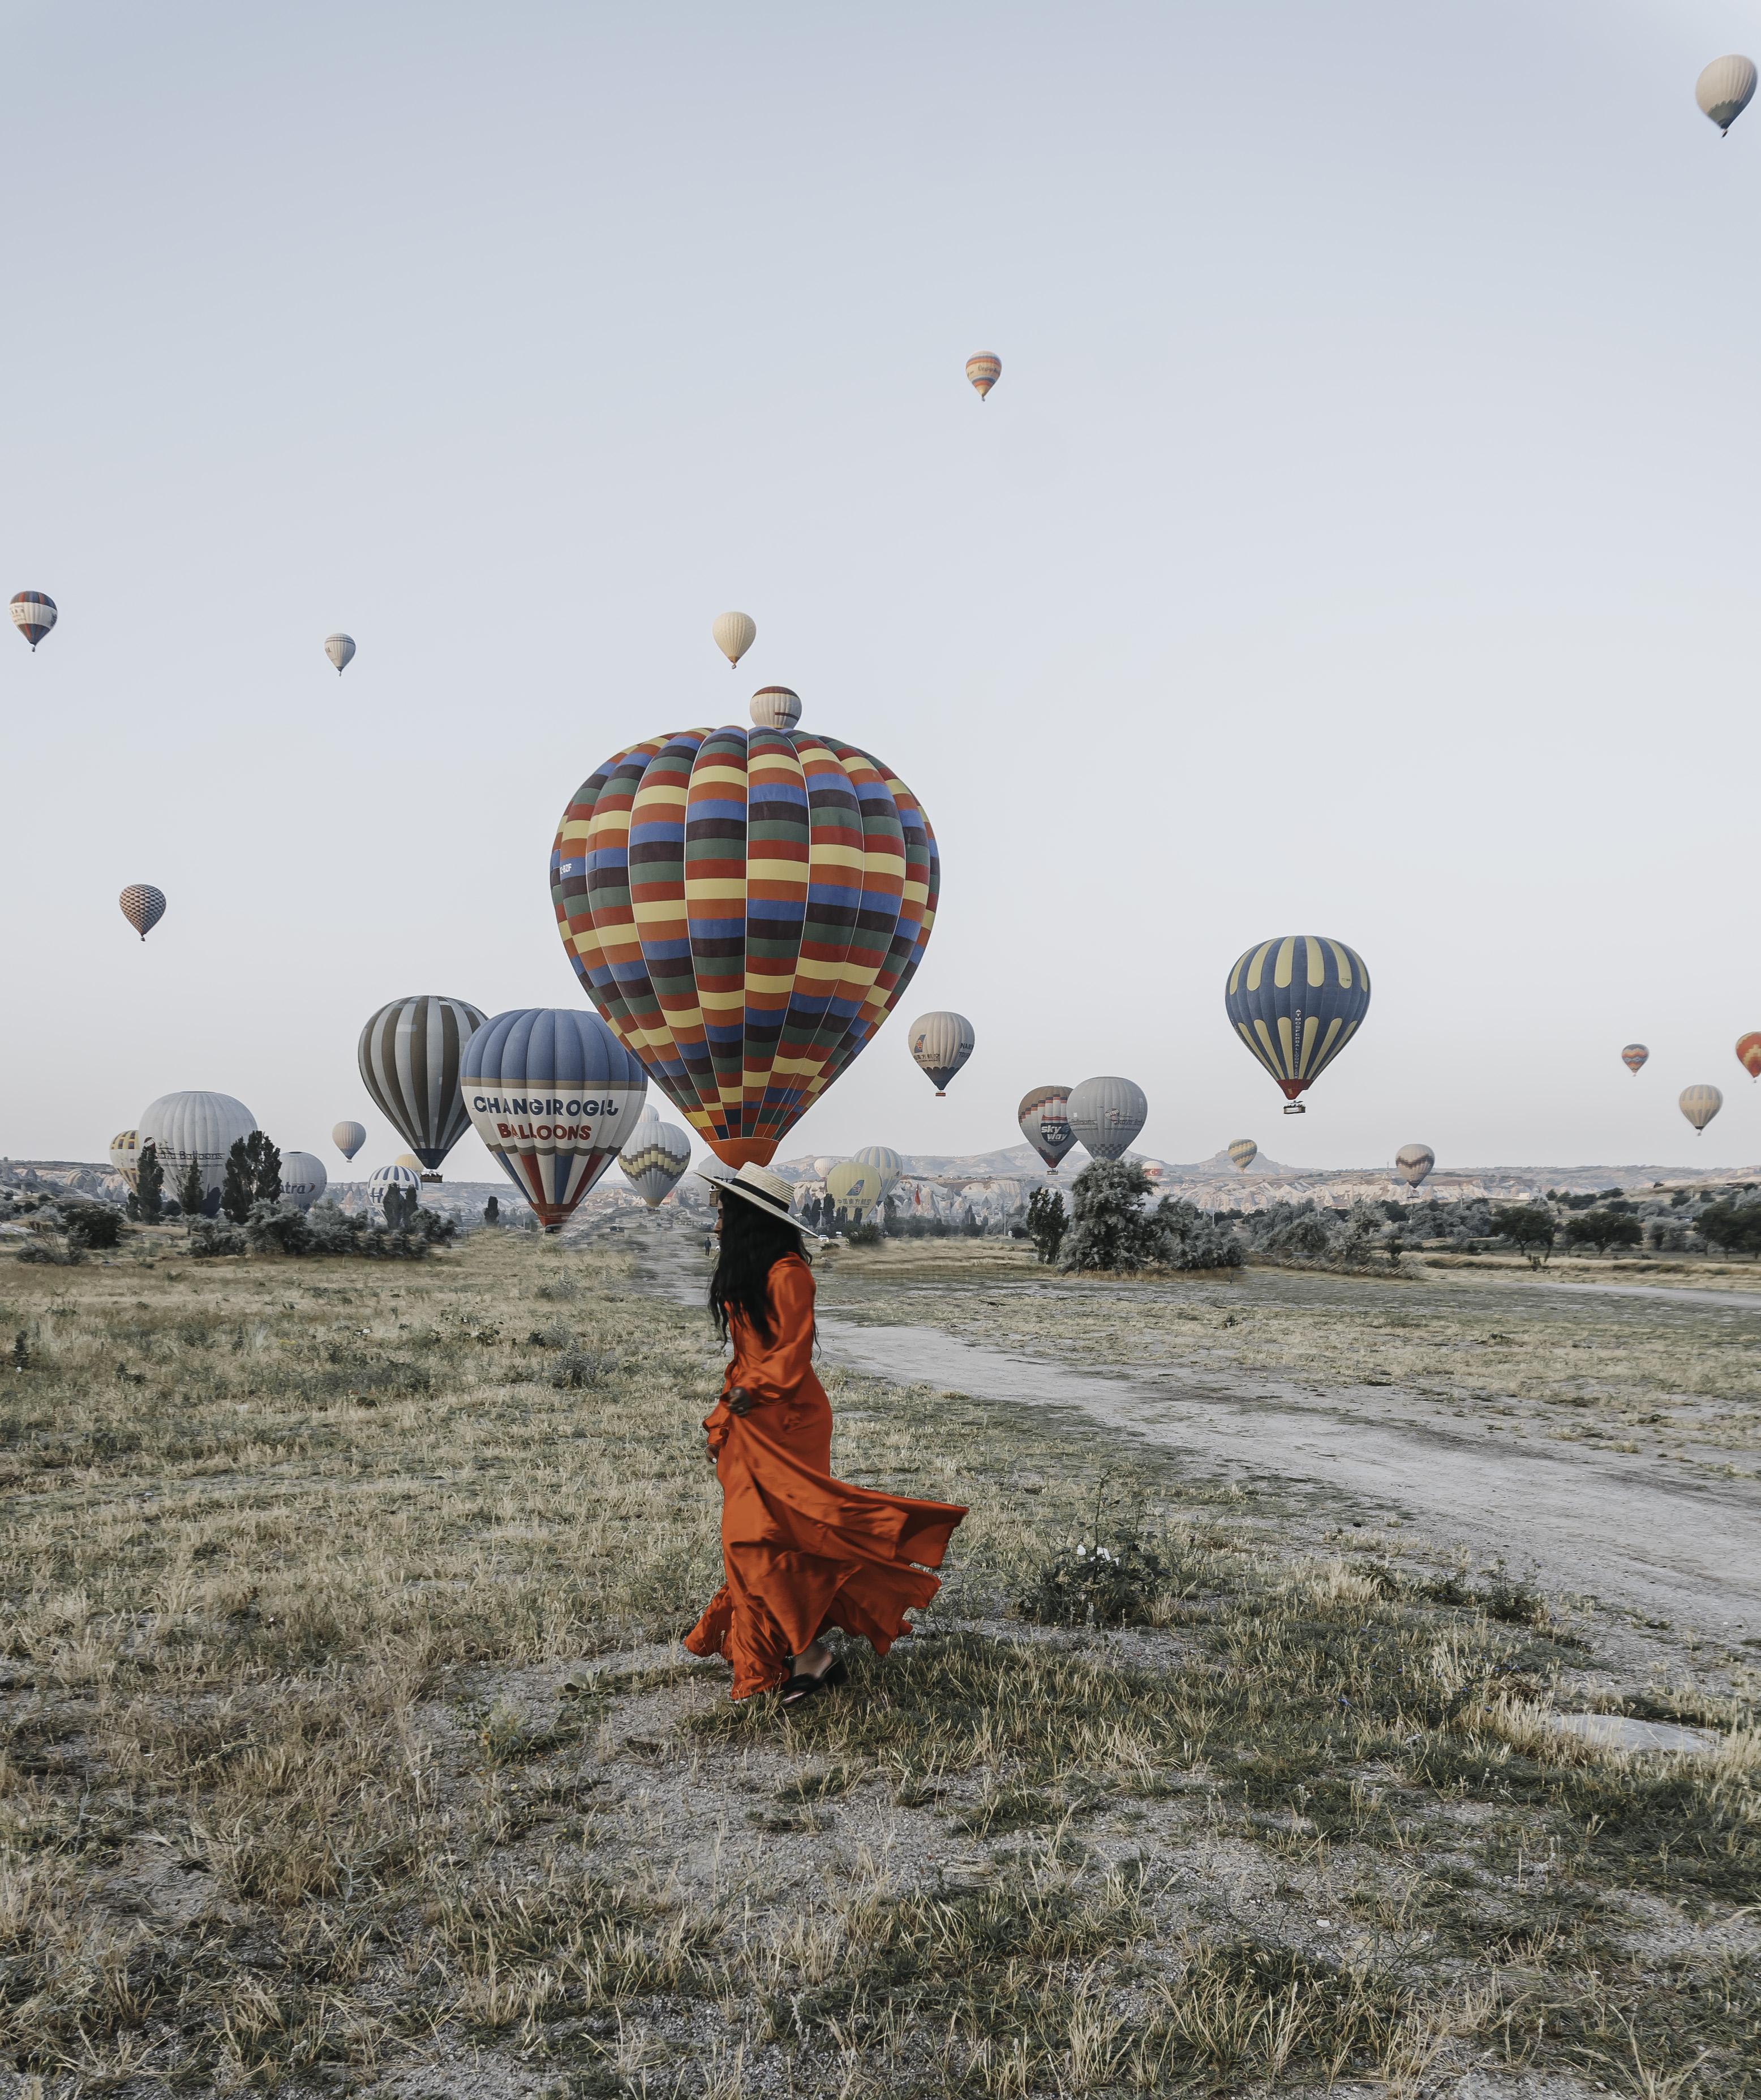 HOT AIR BALLOON CAPPADOCIA | The Jeneralist